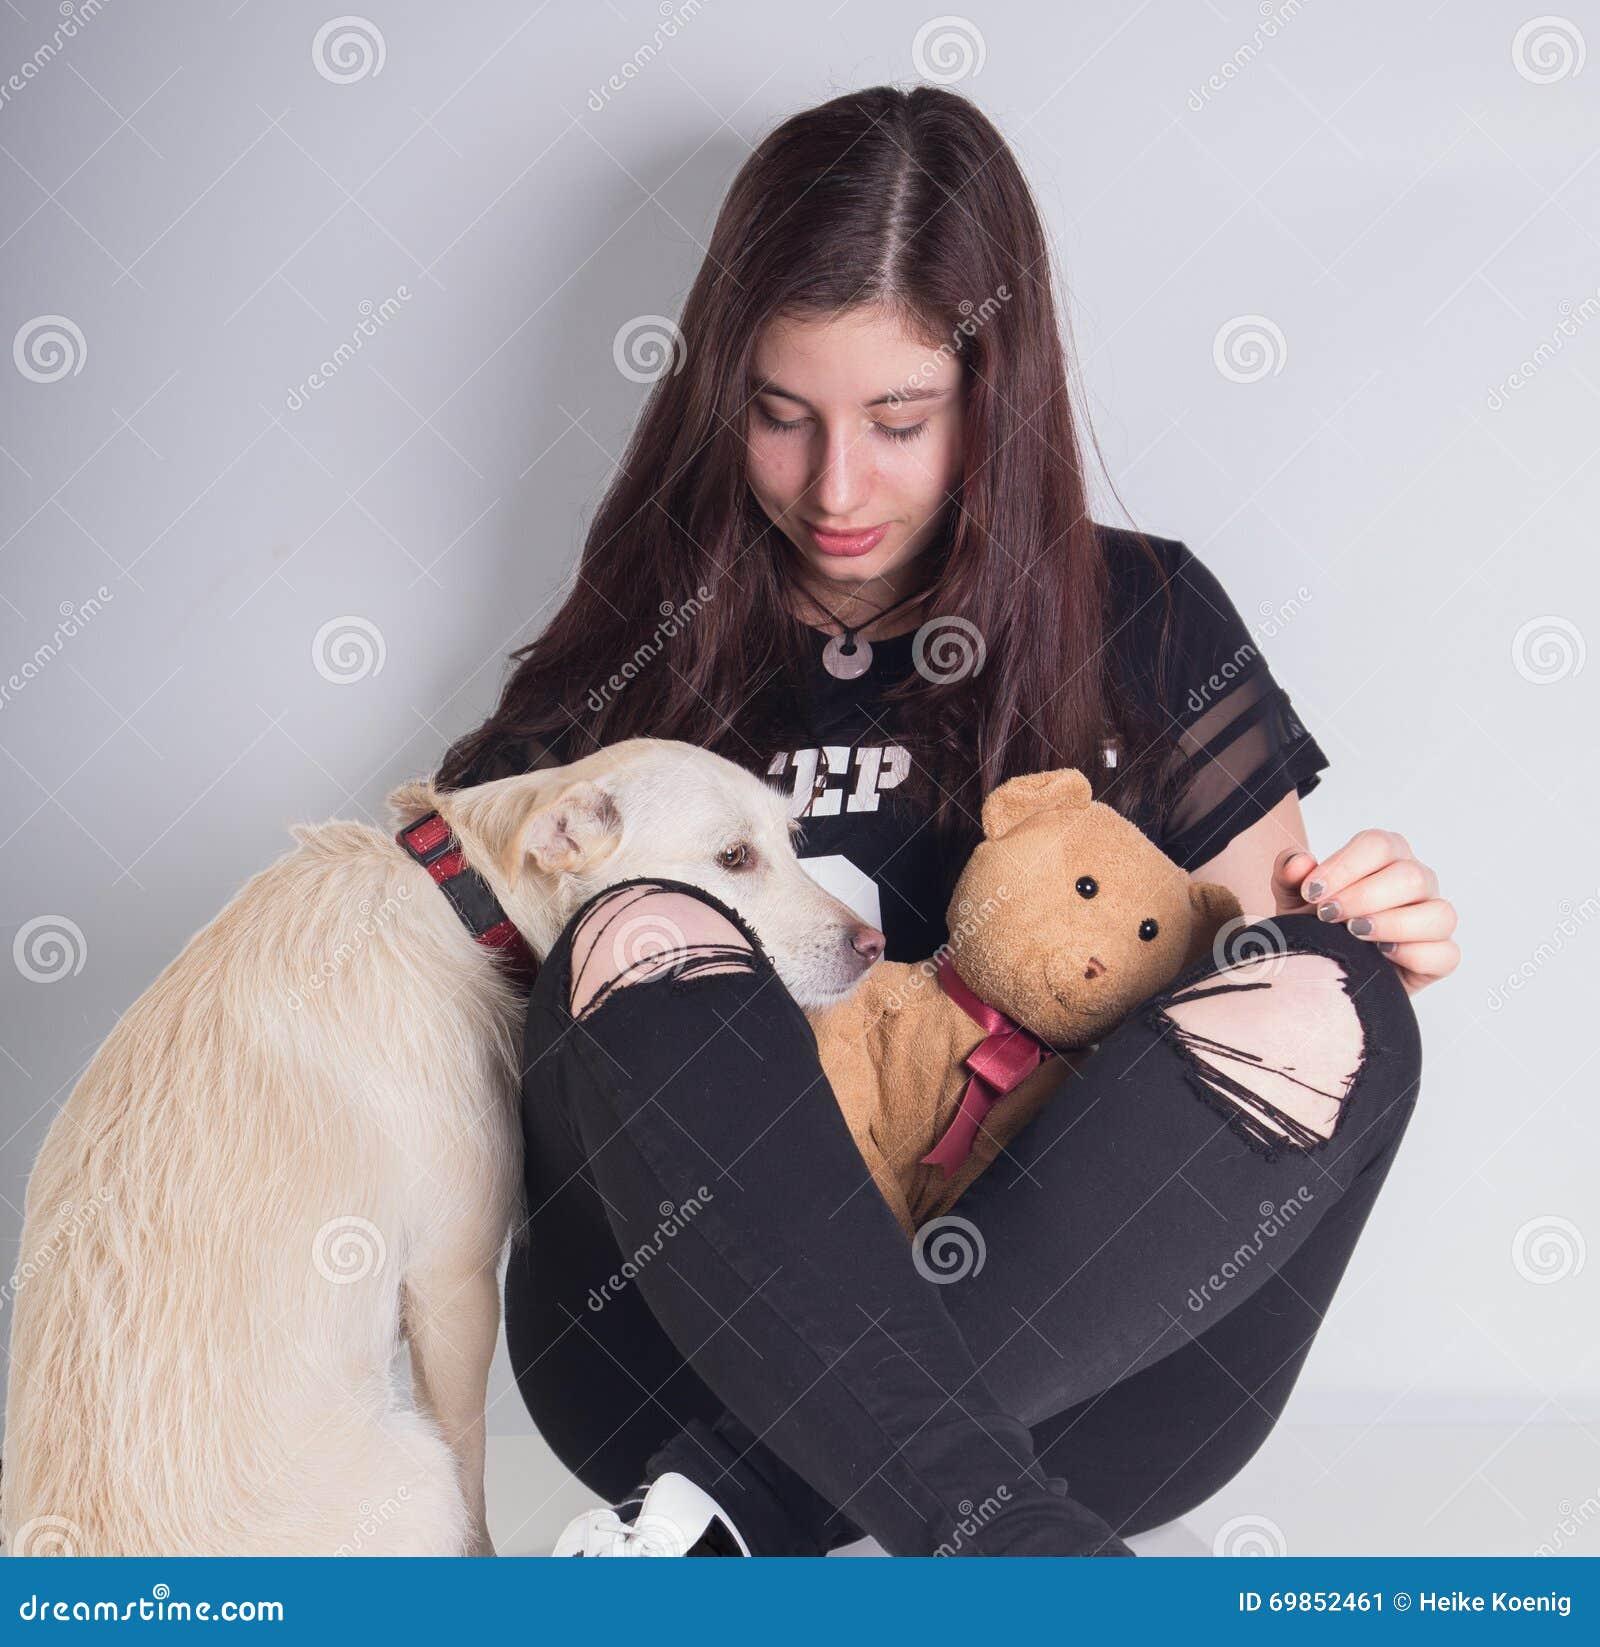 Beautiful girl with teddybear and sad looking dog